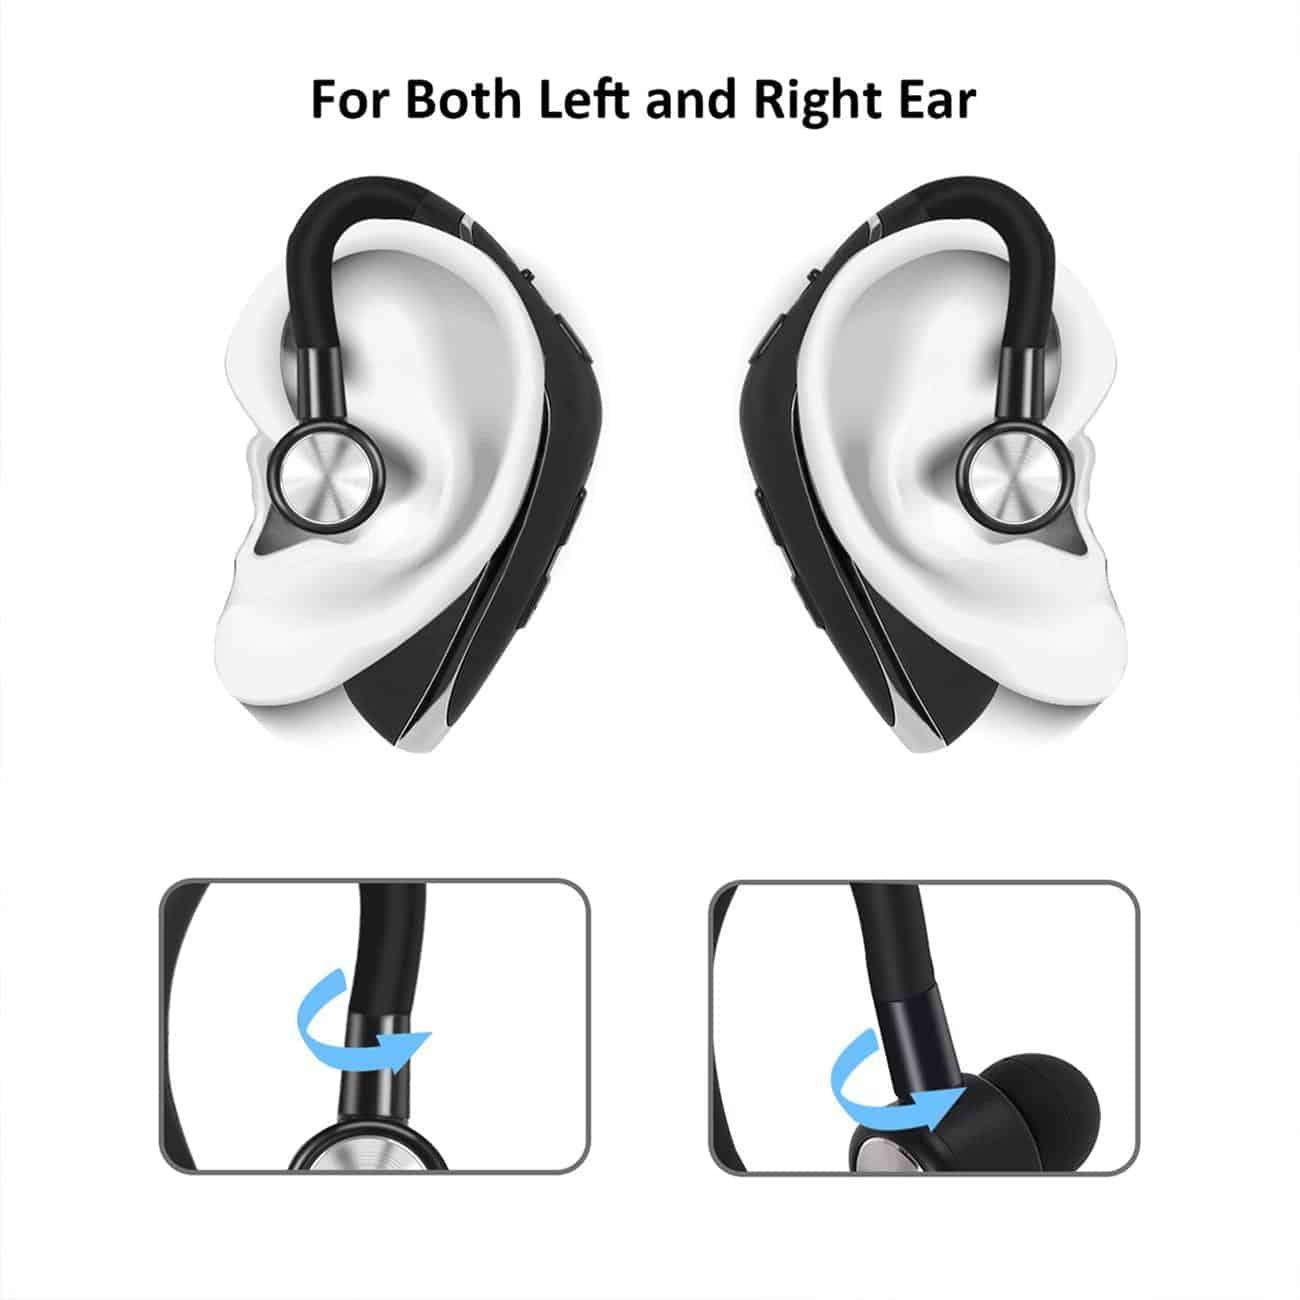 Honbio True Wireless Stereo Earbuds